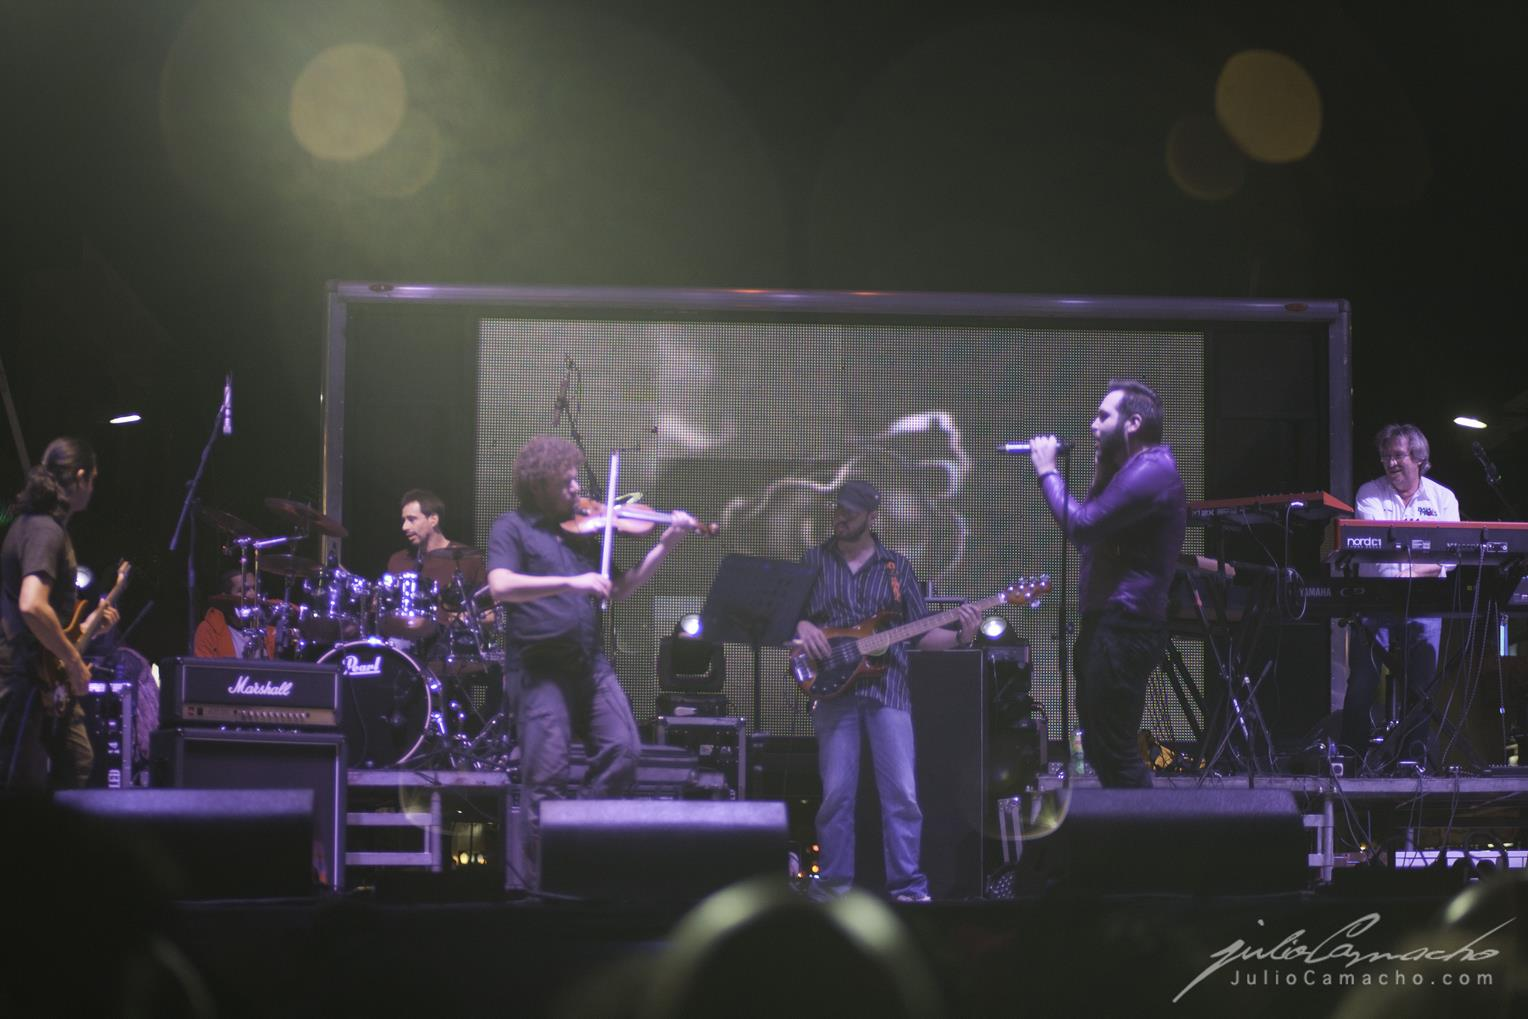 2014-10-30 31 CAST TOUR Ensenada y Tijuana - 1403 - www.Juli (Copy).jpg